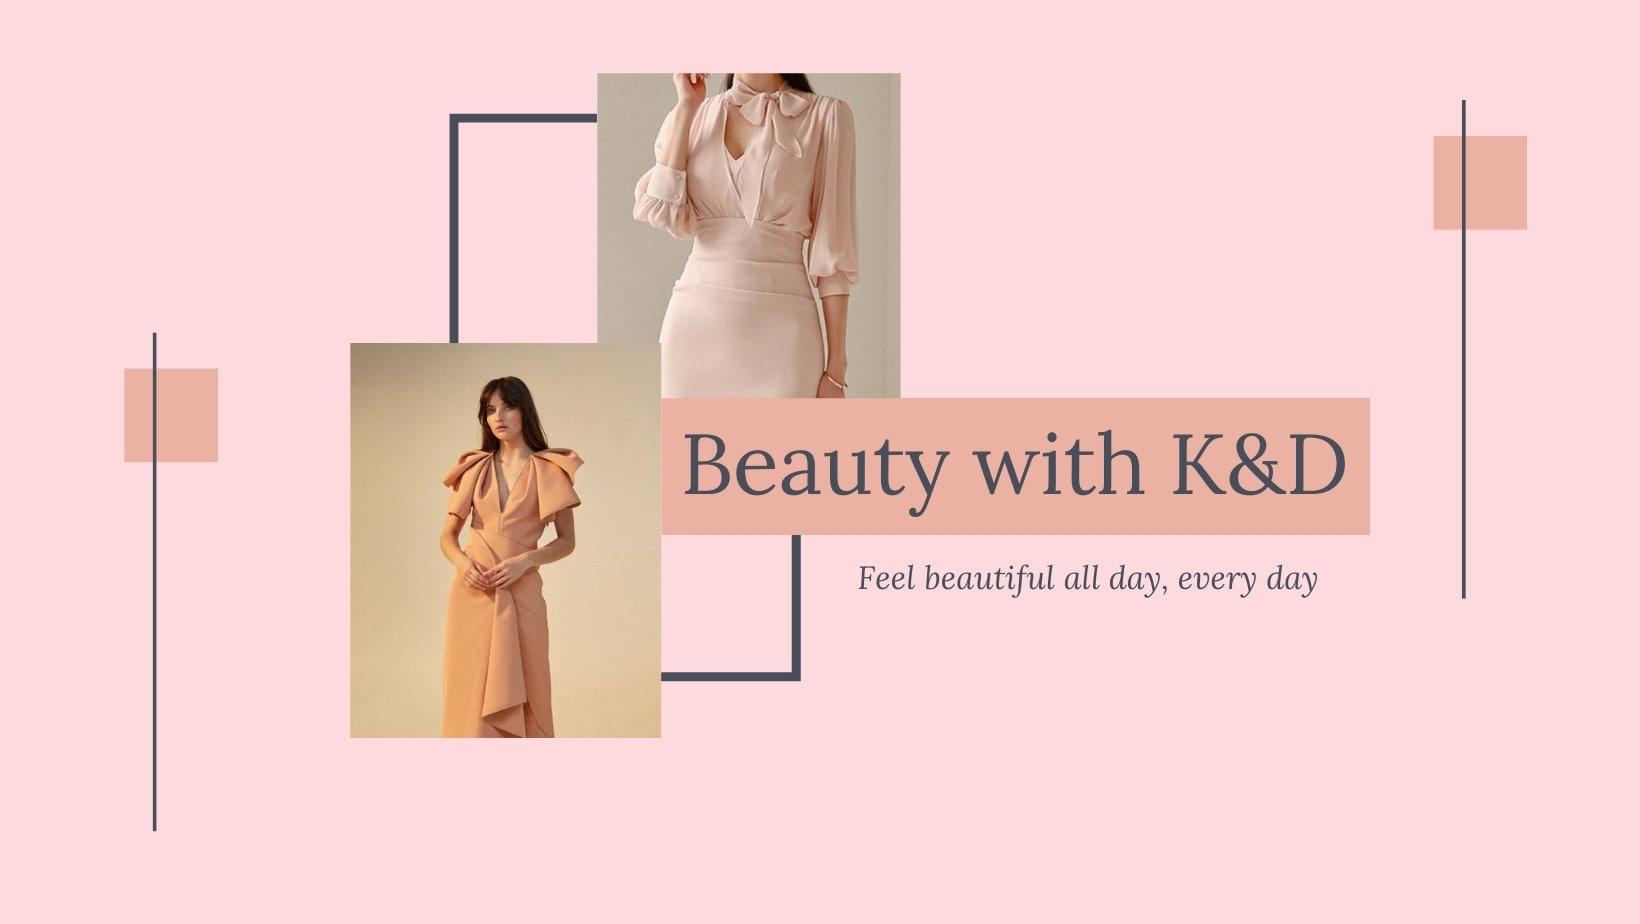 Shop Thời Trang K&D (@shopthoitrangkd) Cover Image